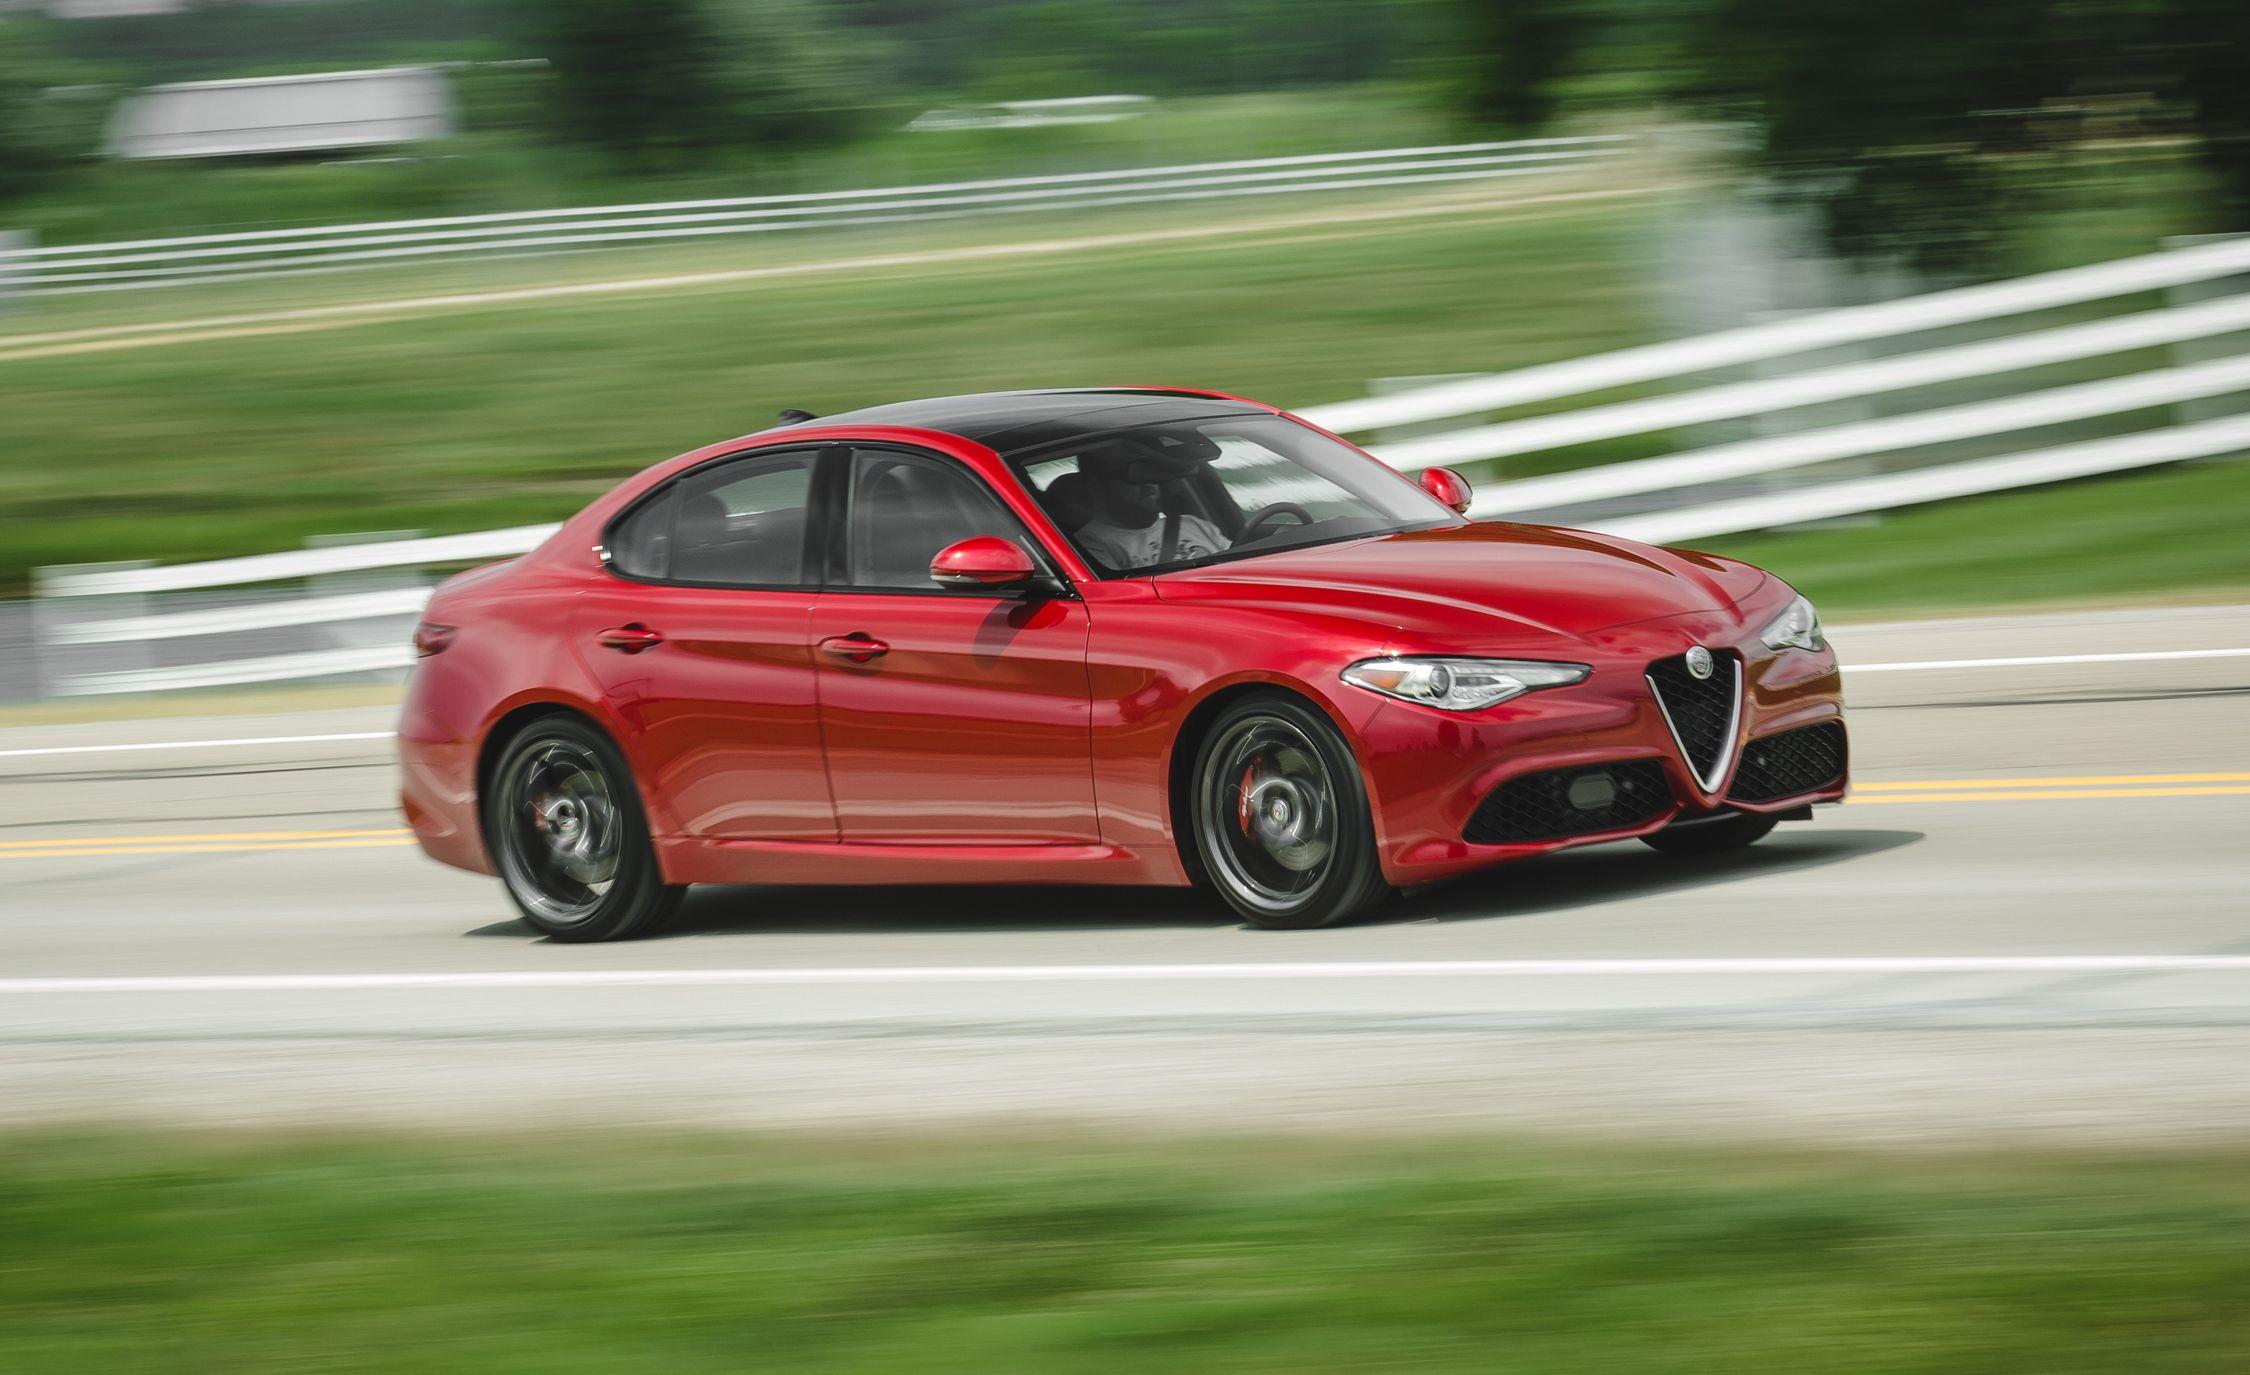 2017 Alfa Romeo Giulia 2 0t Rwd Test Review Car And Driver